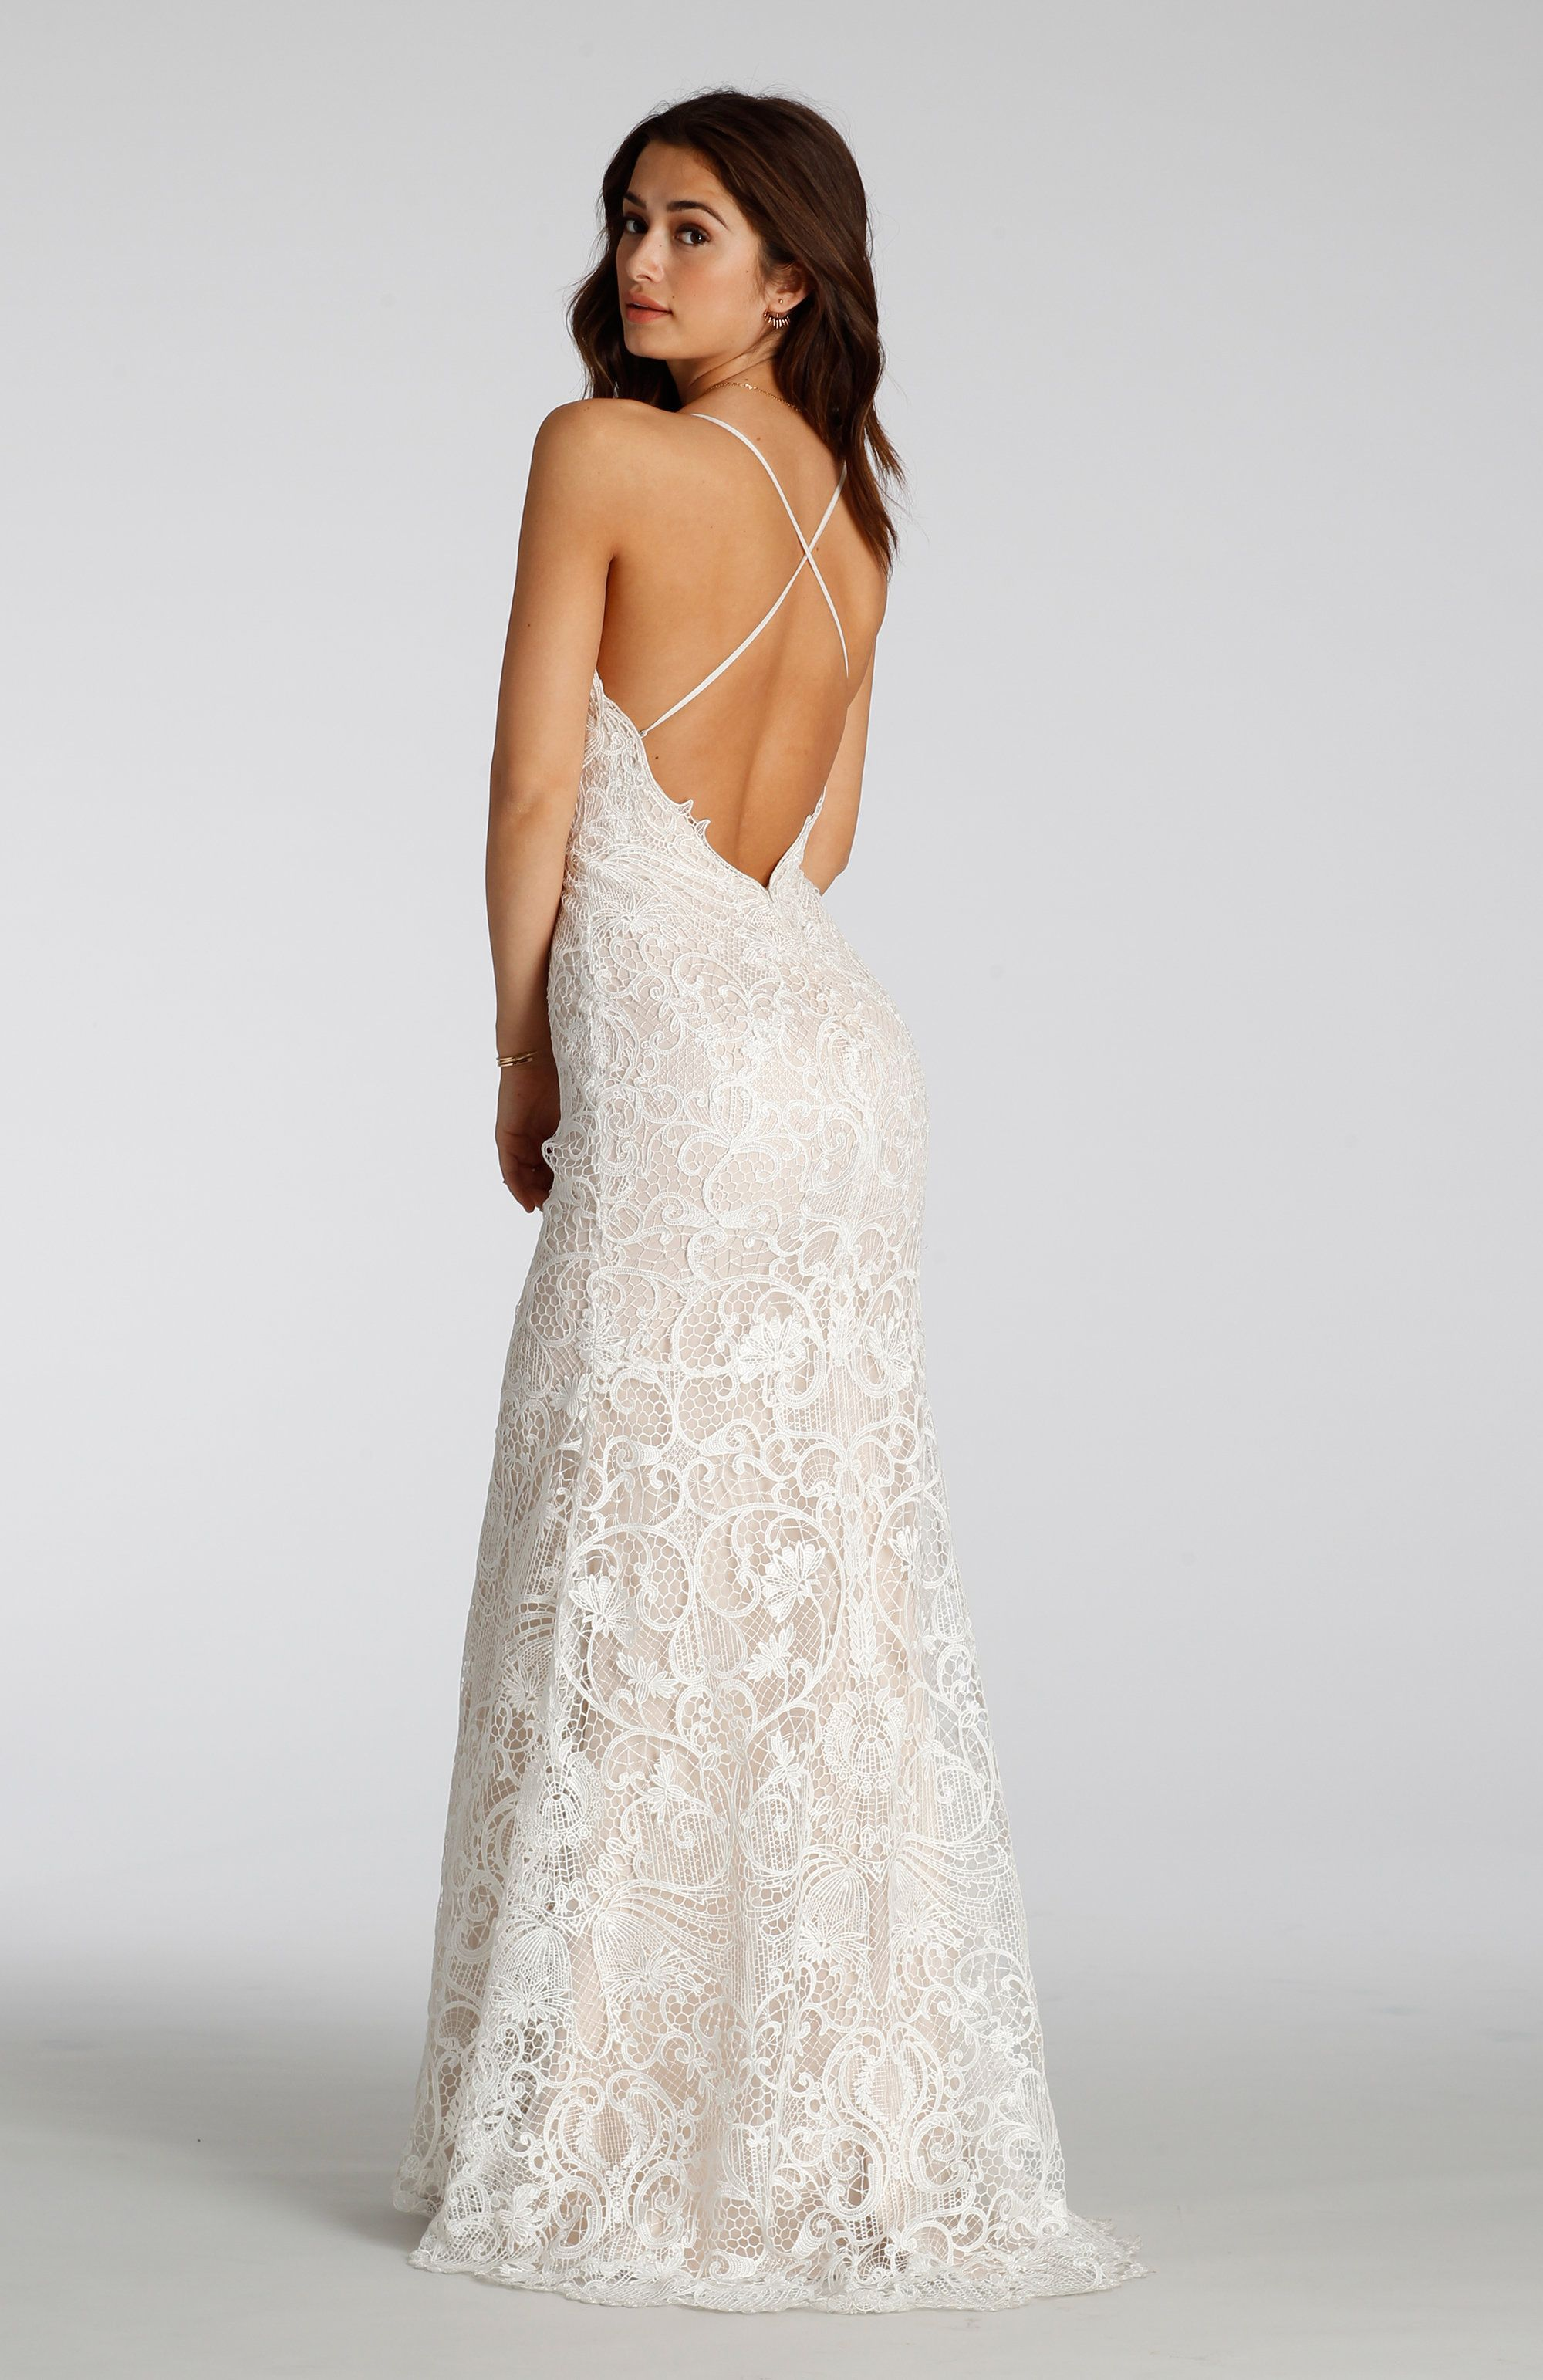 ti adora by alvina valenta available at luluus bridal